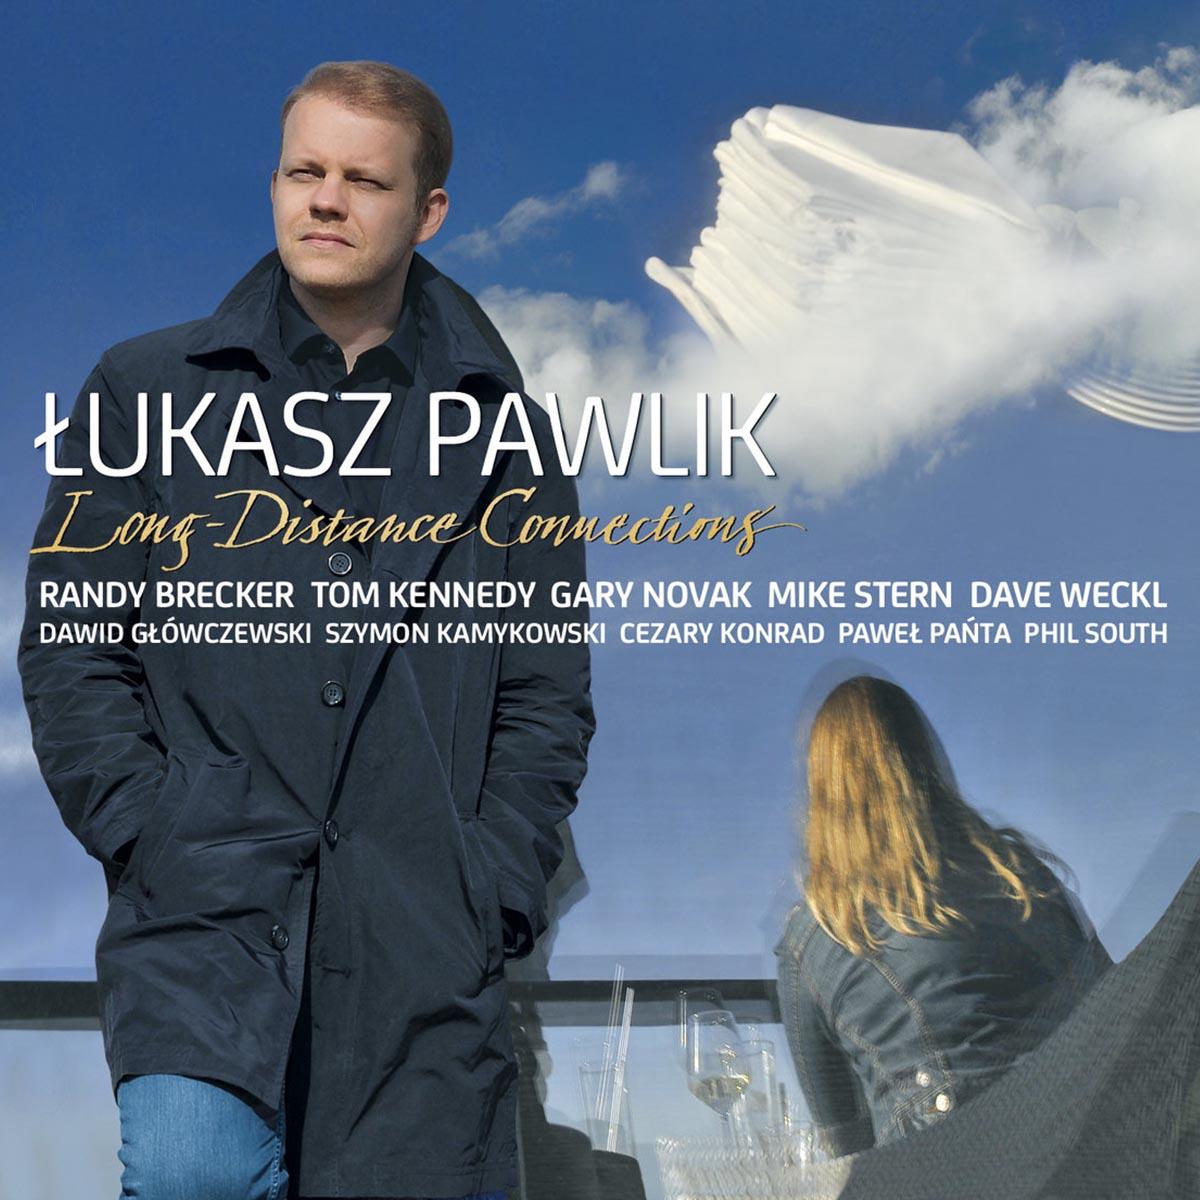 lukasz-pawlik-long-distance-connections-b-iext54672483.jpg